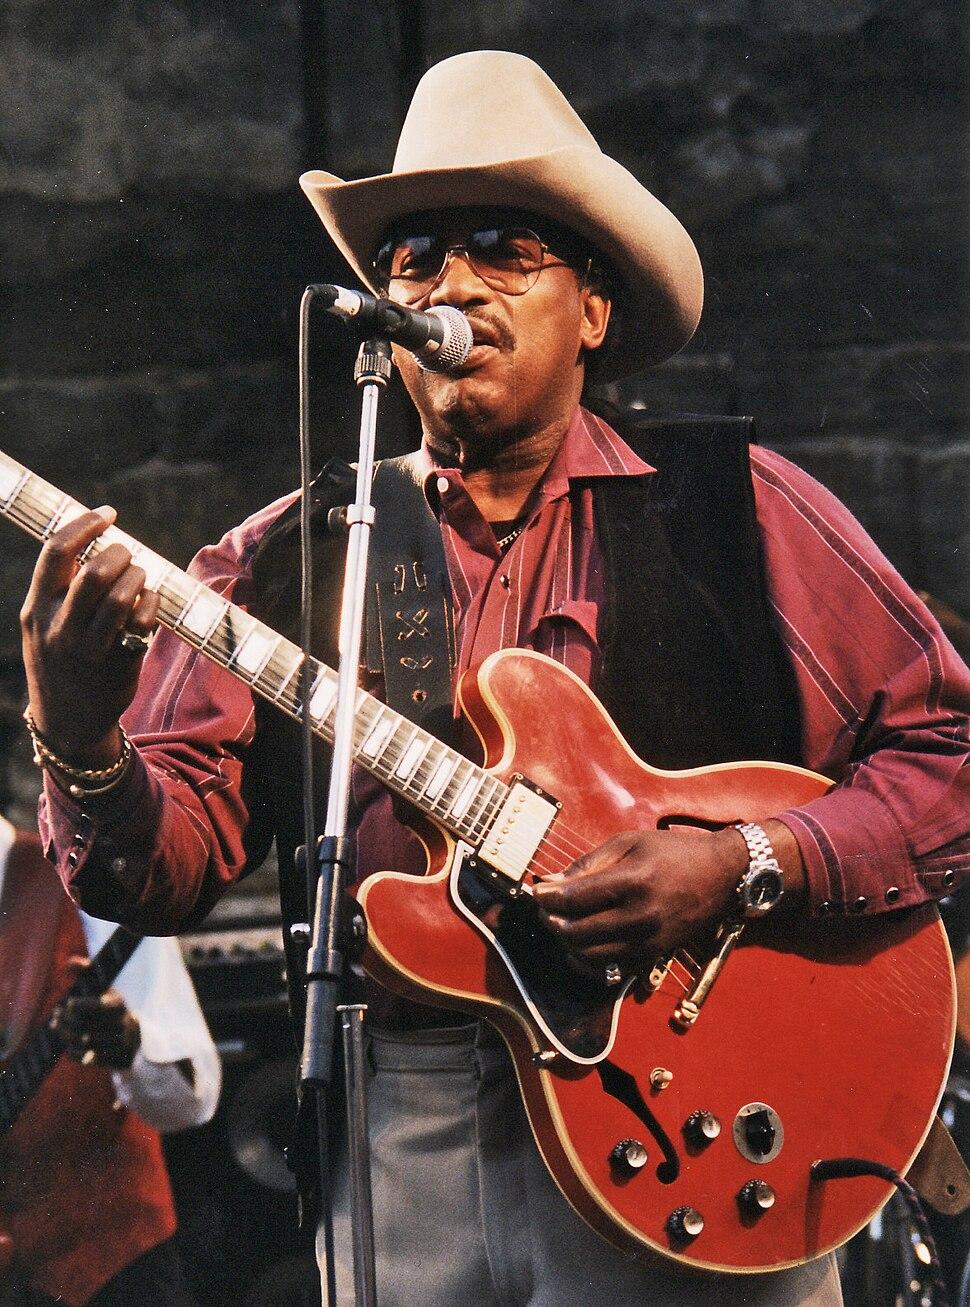 Otis Rush at Notodden bluesfestival